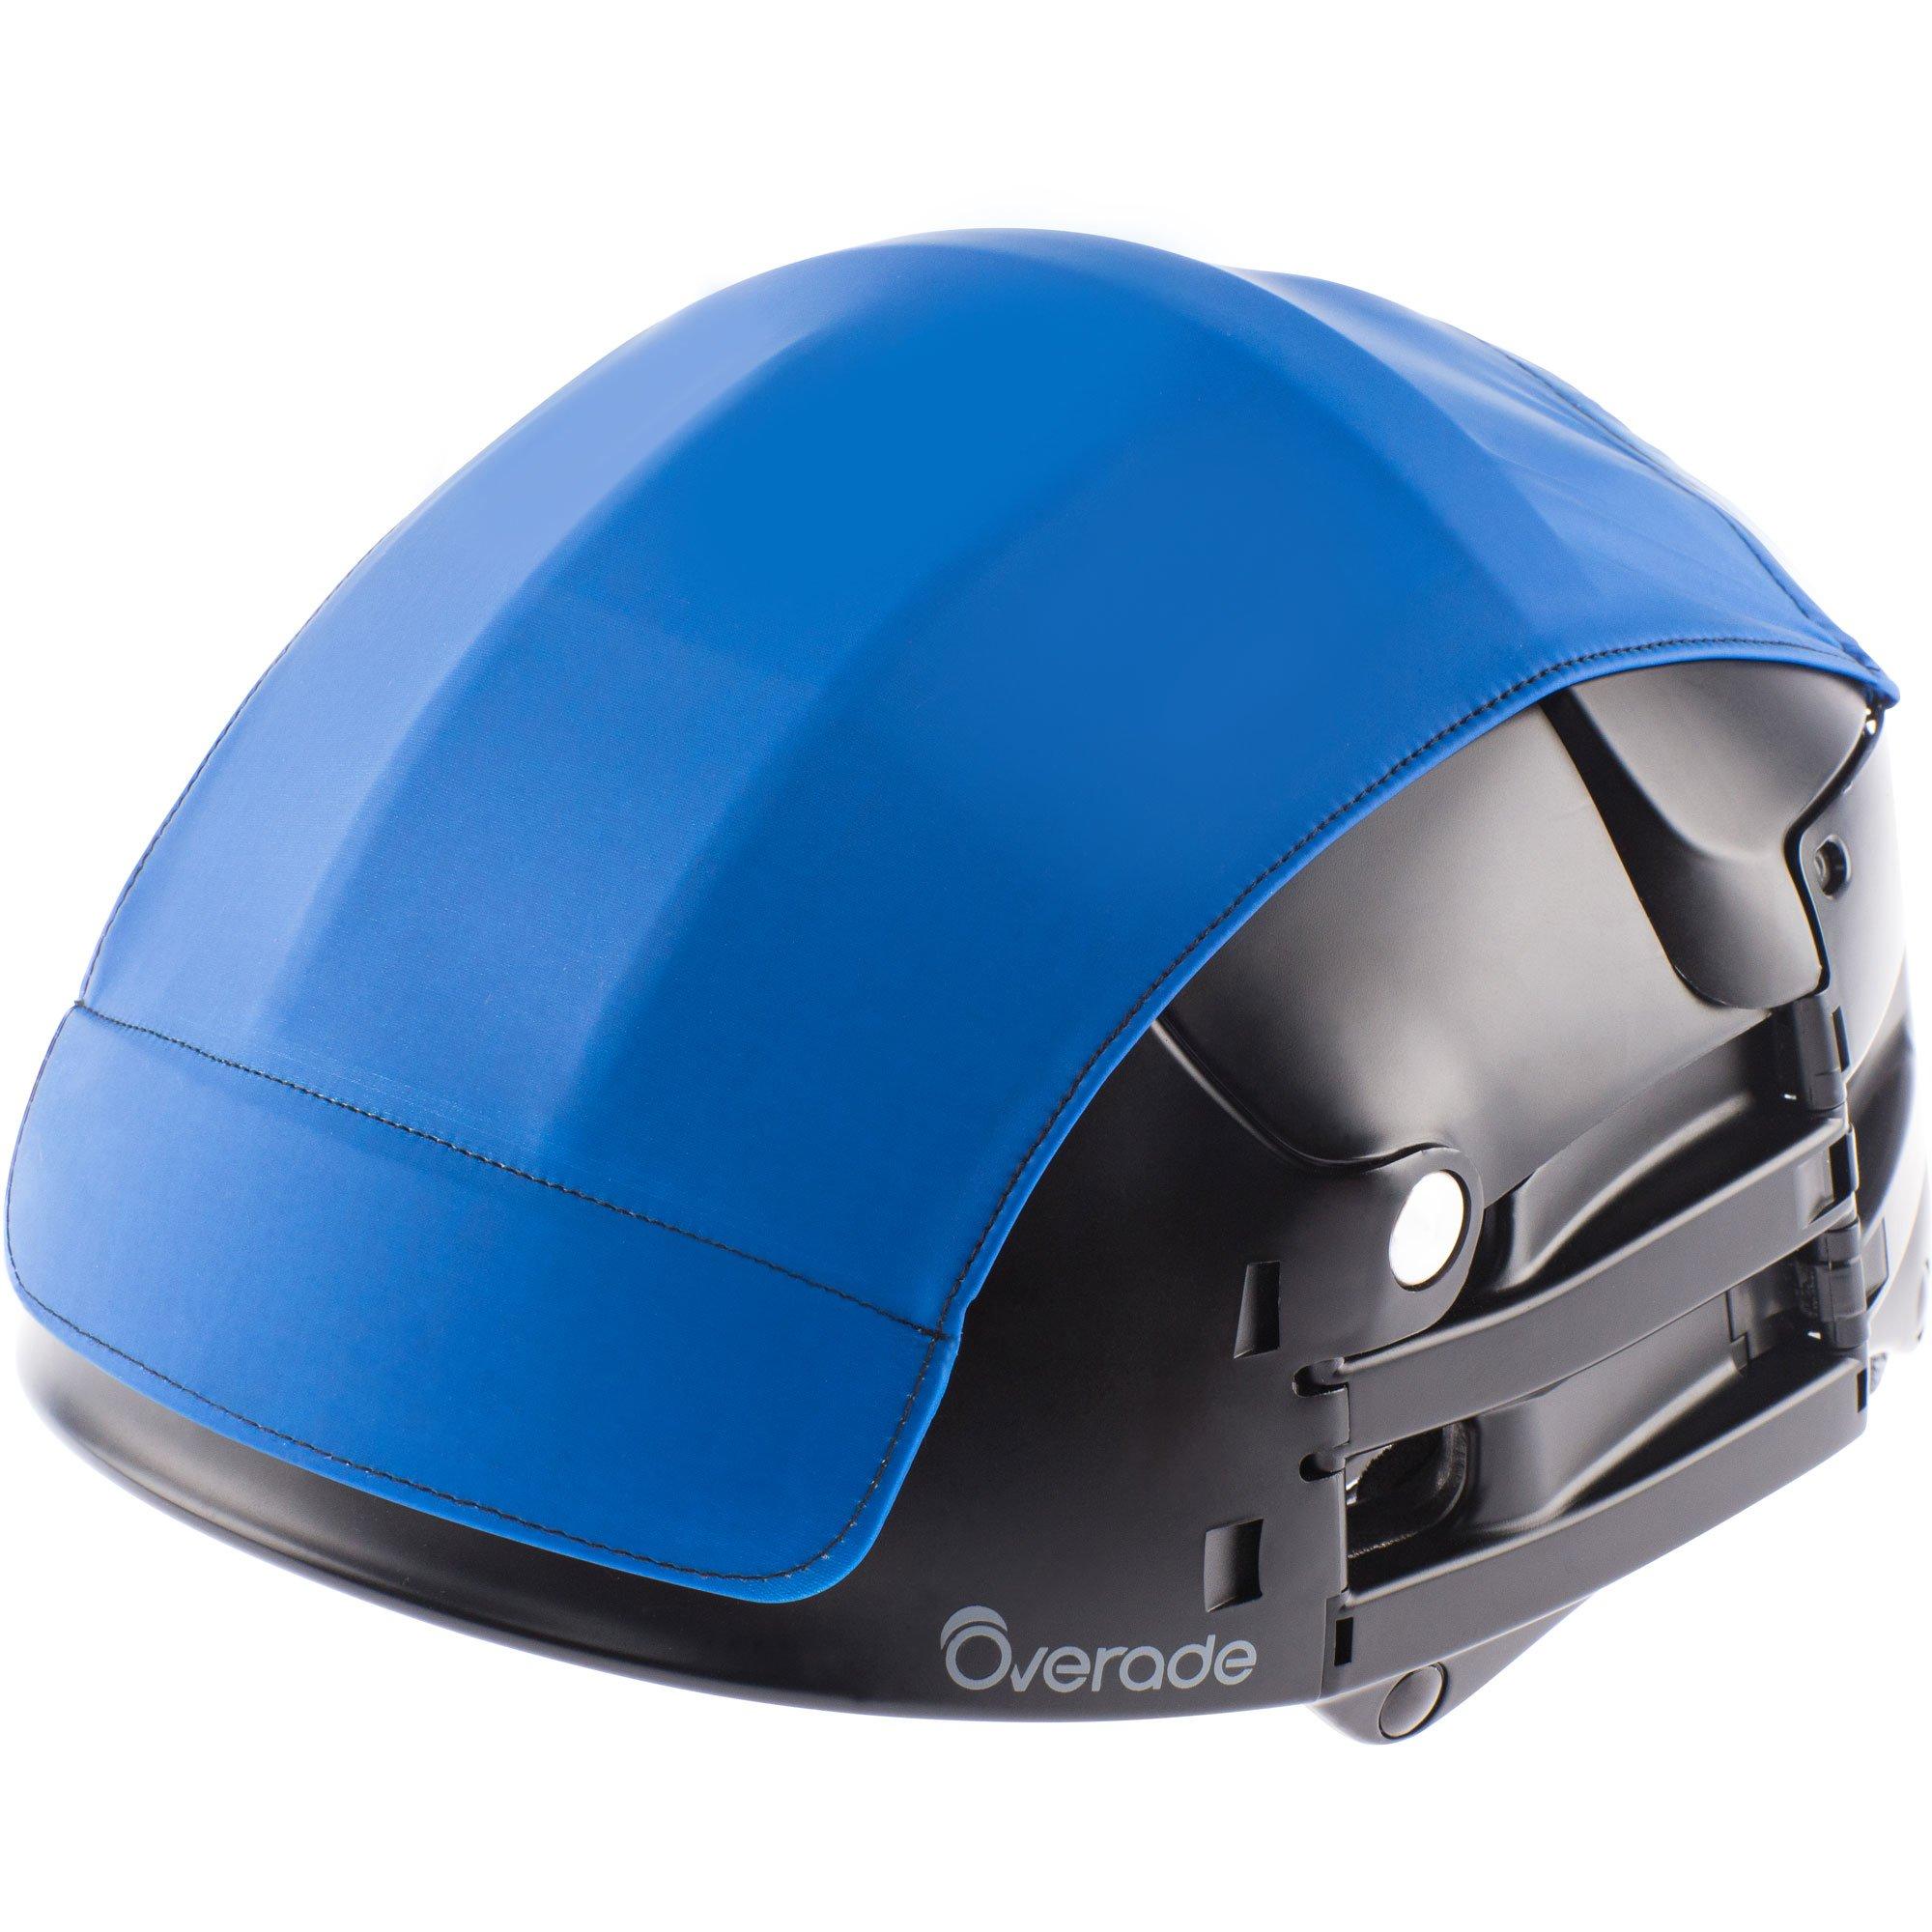 Overade Plixi S-M cover, blå